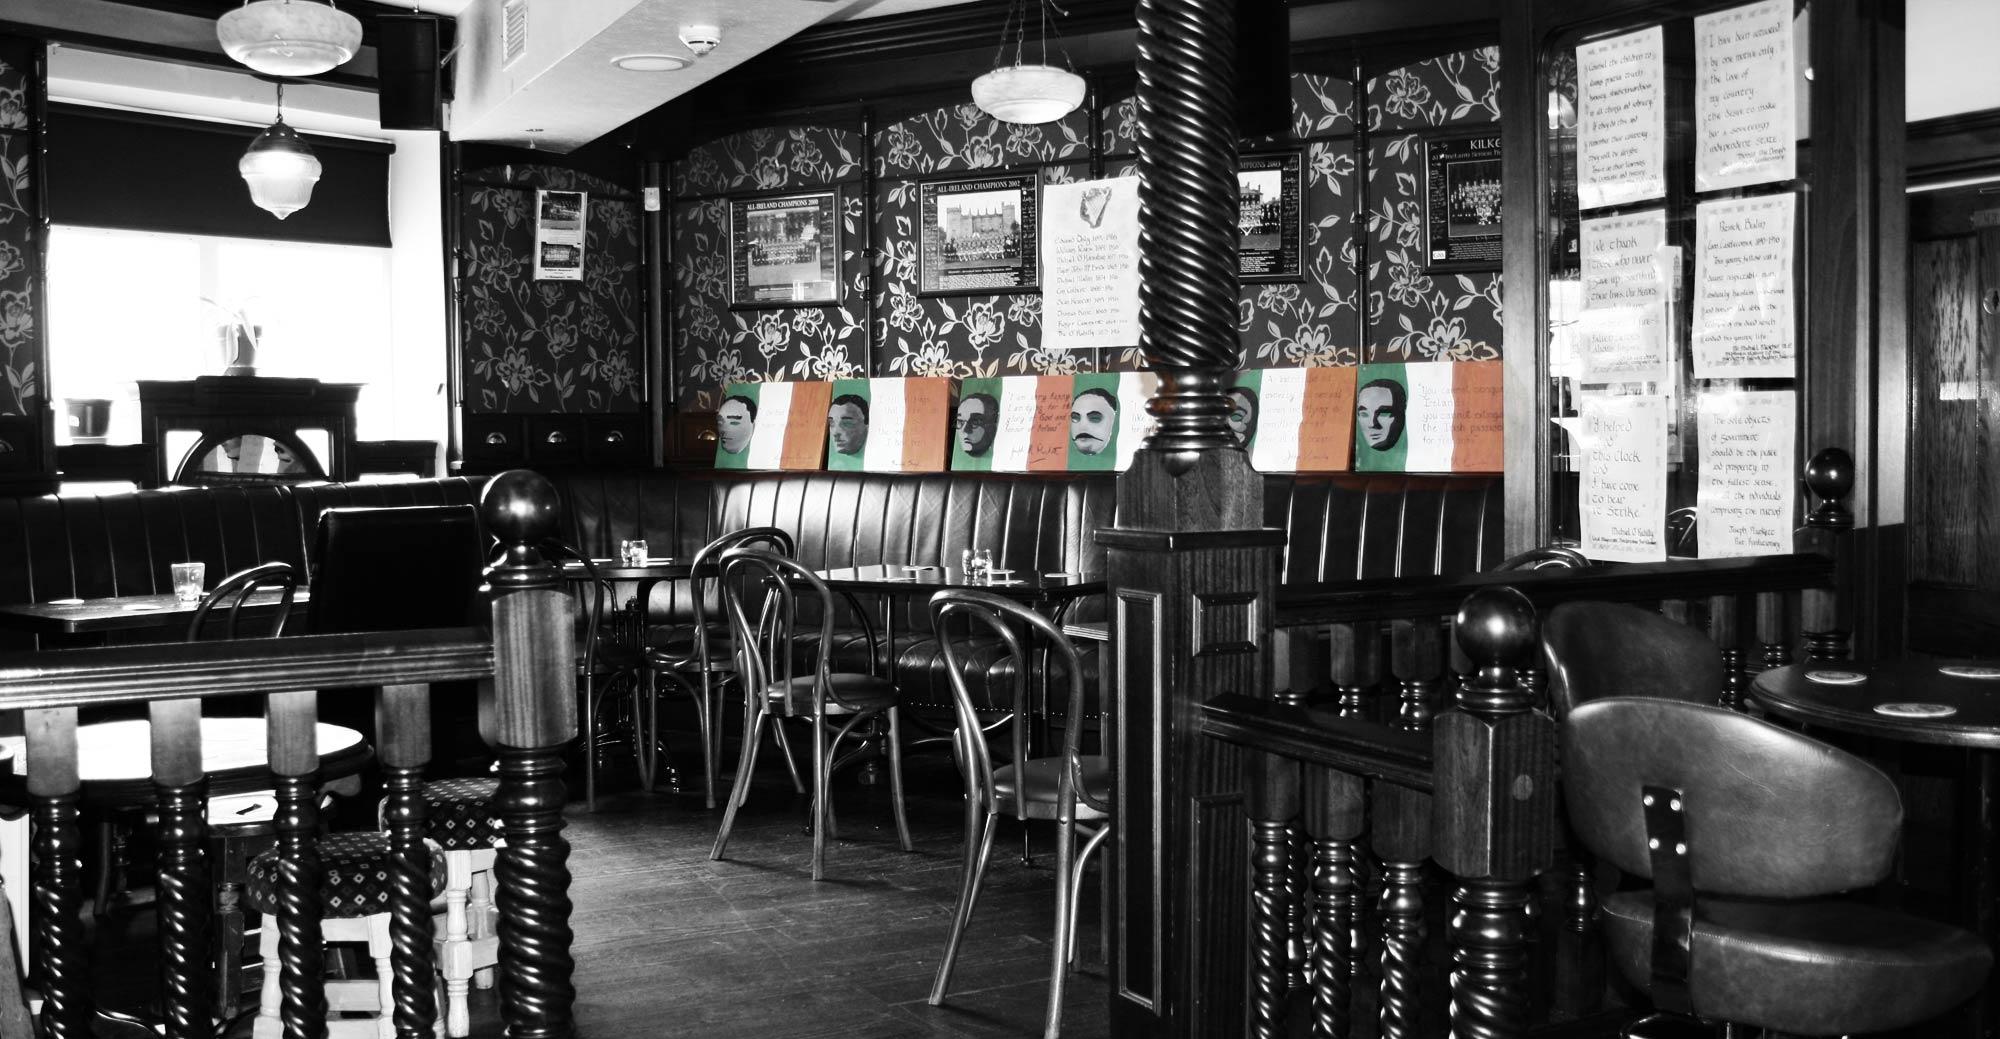 JB's Bar Kilkenny